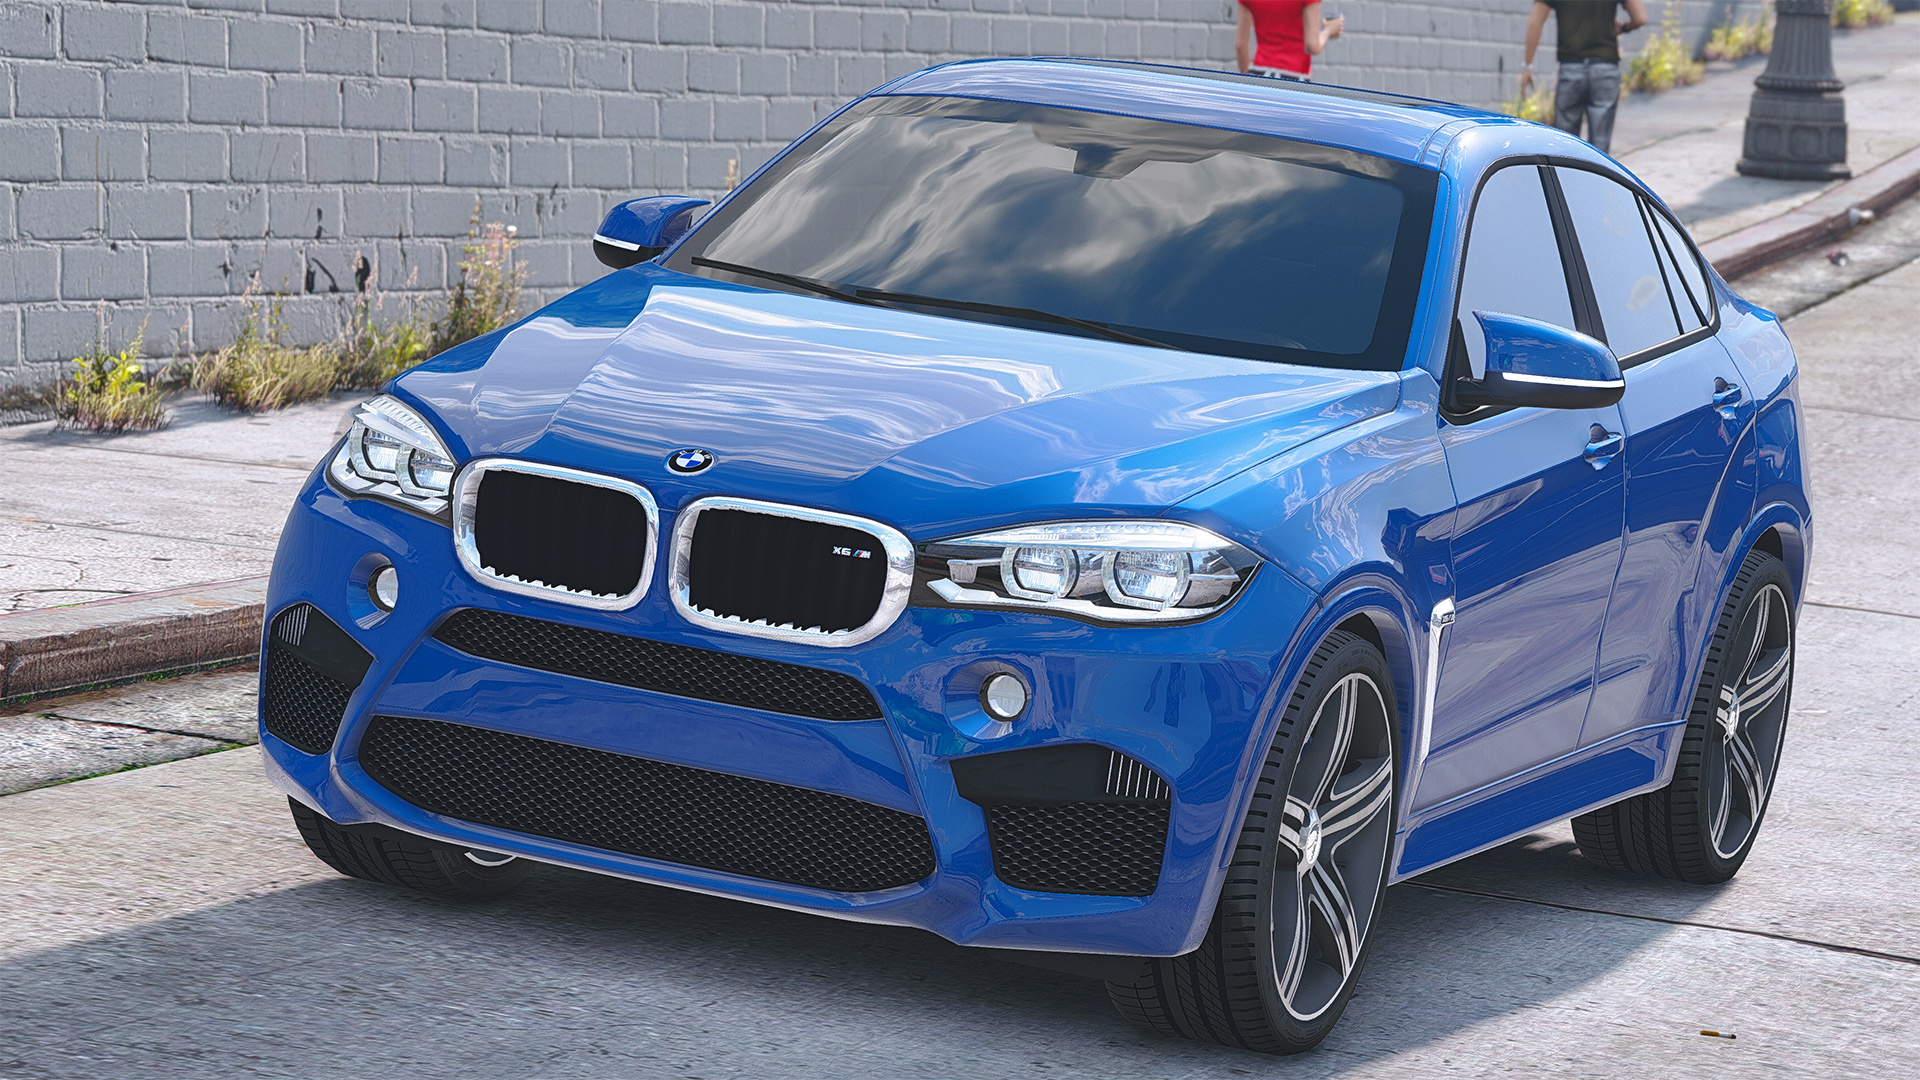 BMW X6M F16 [Add-On / Replace | Animated] - GTA5-Mods com